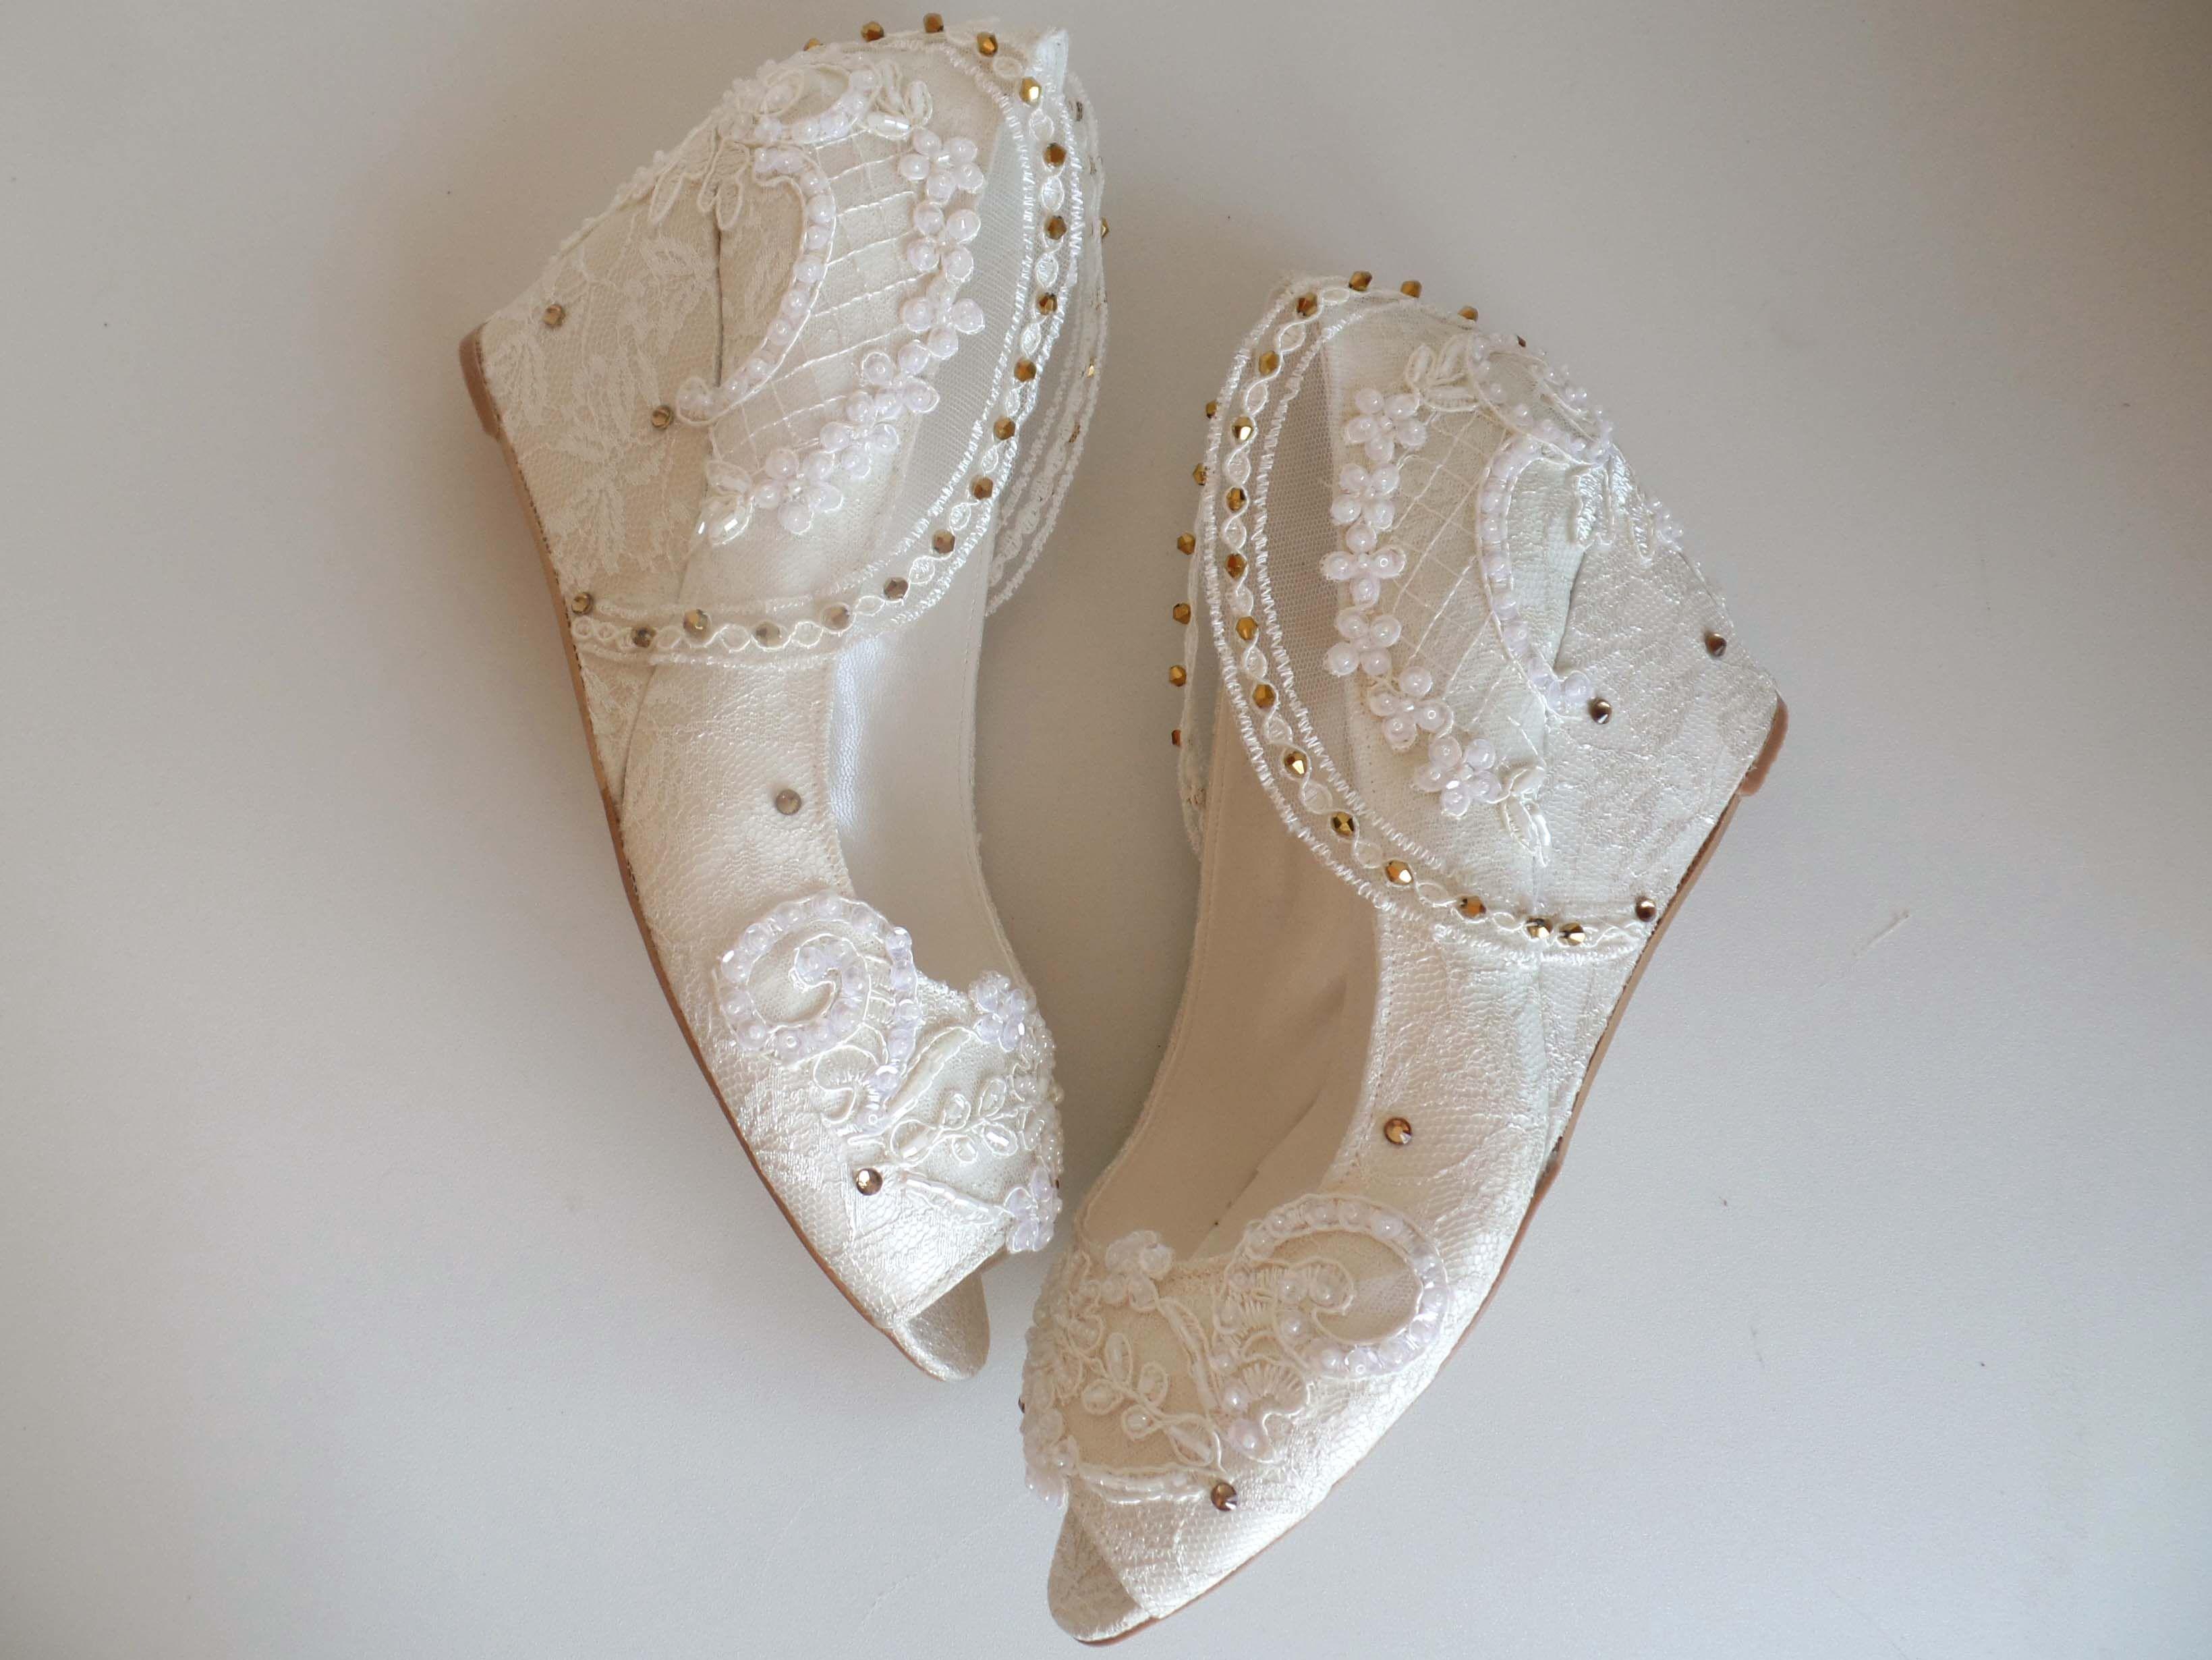 Boho wedding wedges embellished lace bridal wedge shoes with pearls